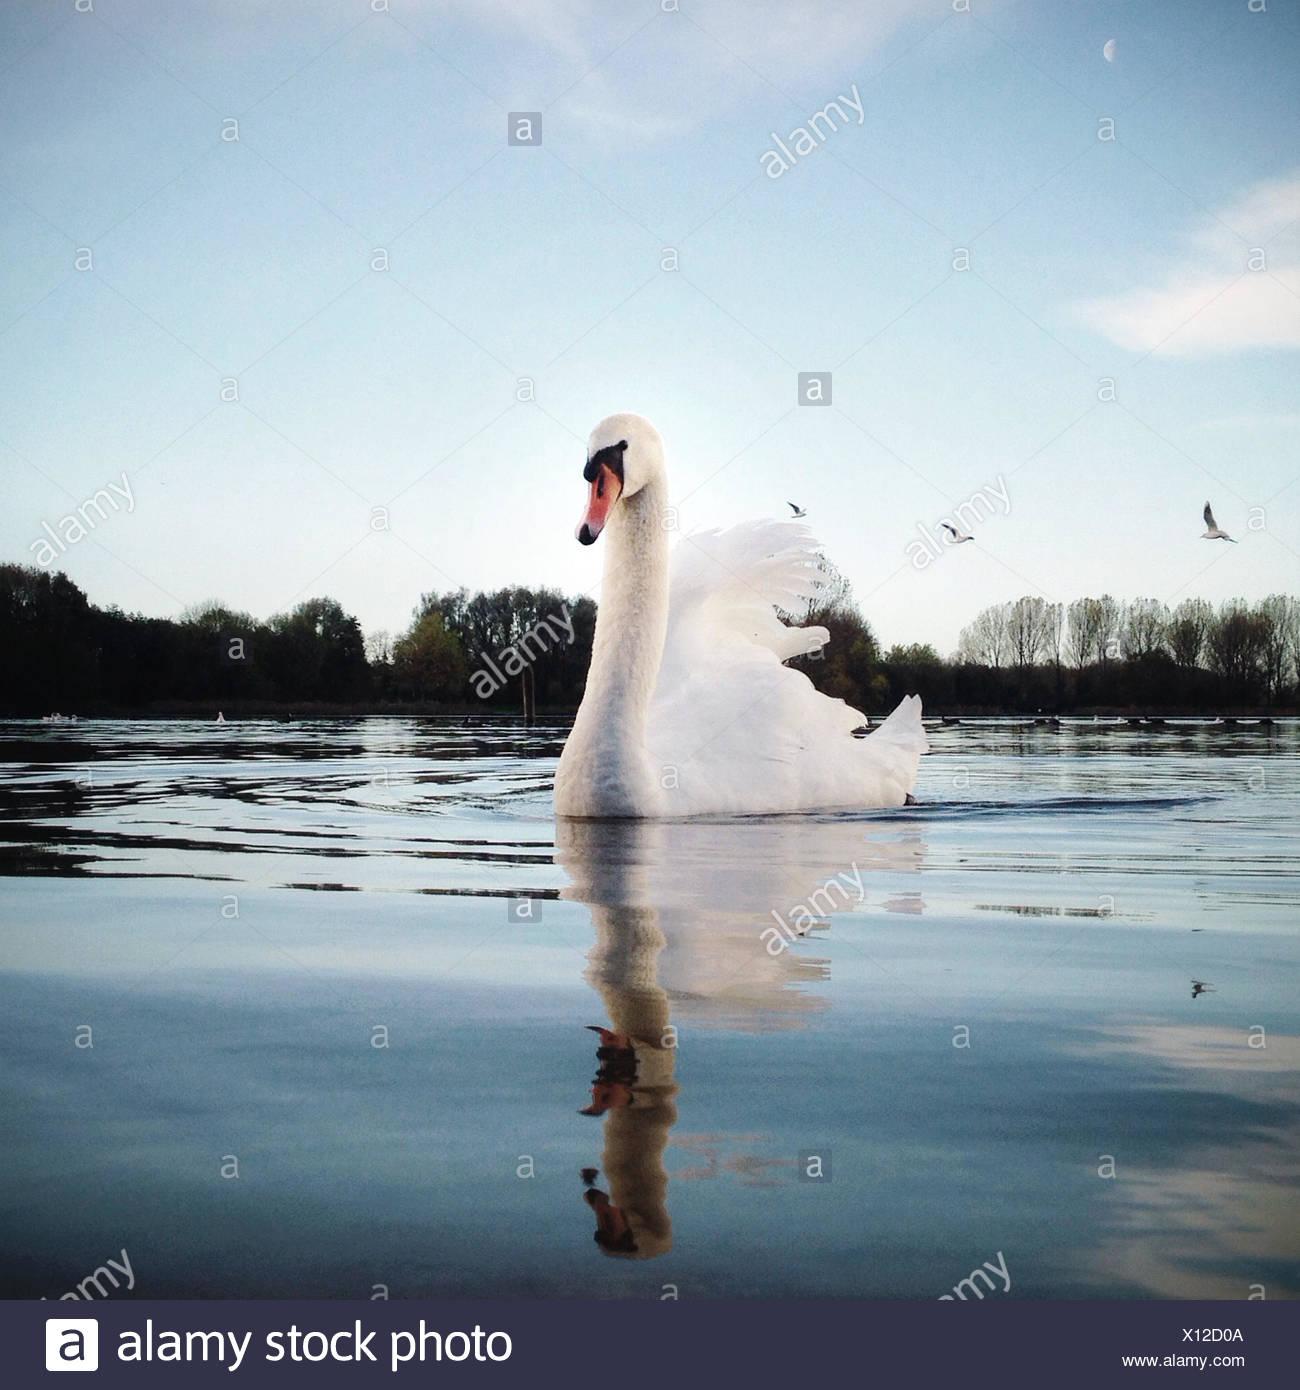 Portrait of swan swimming on lake - Stock Image